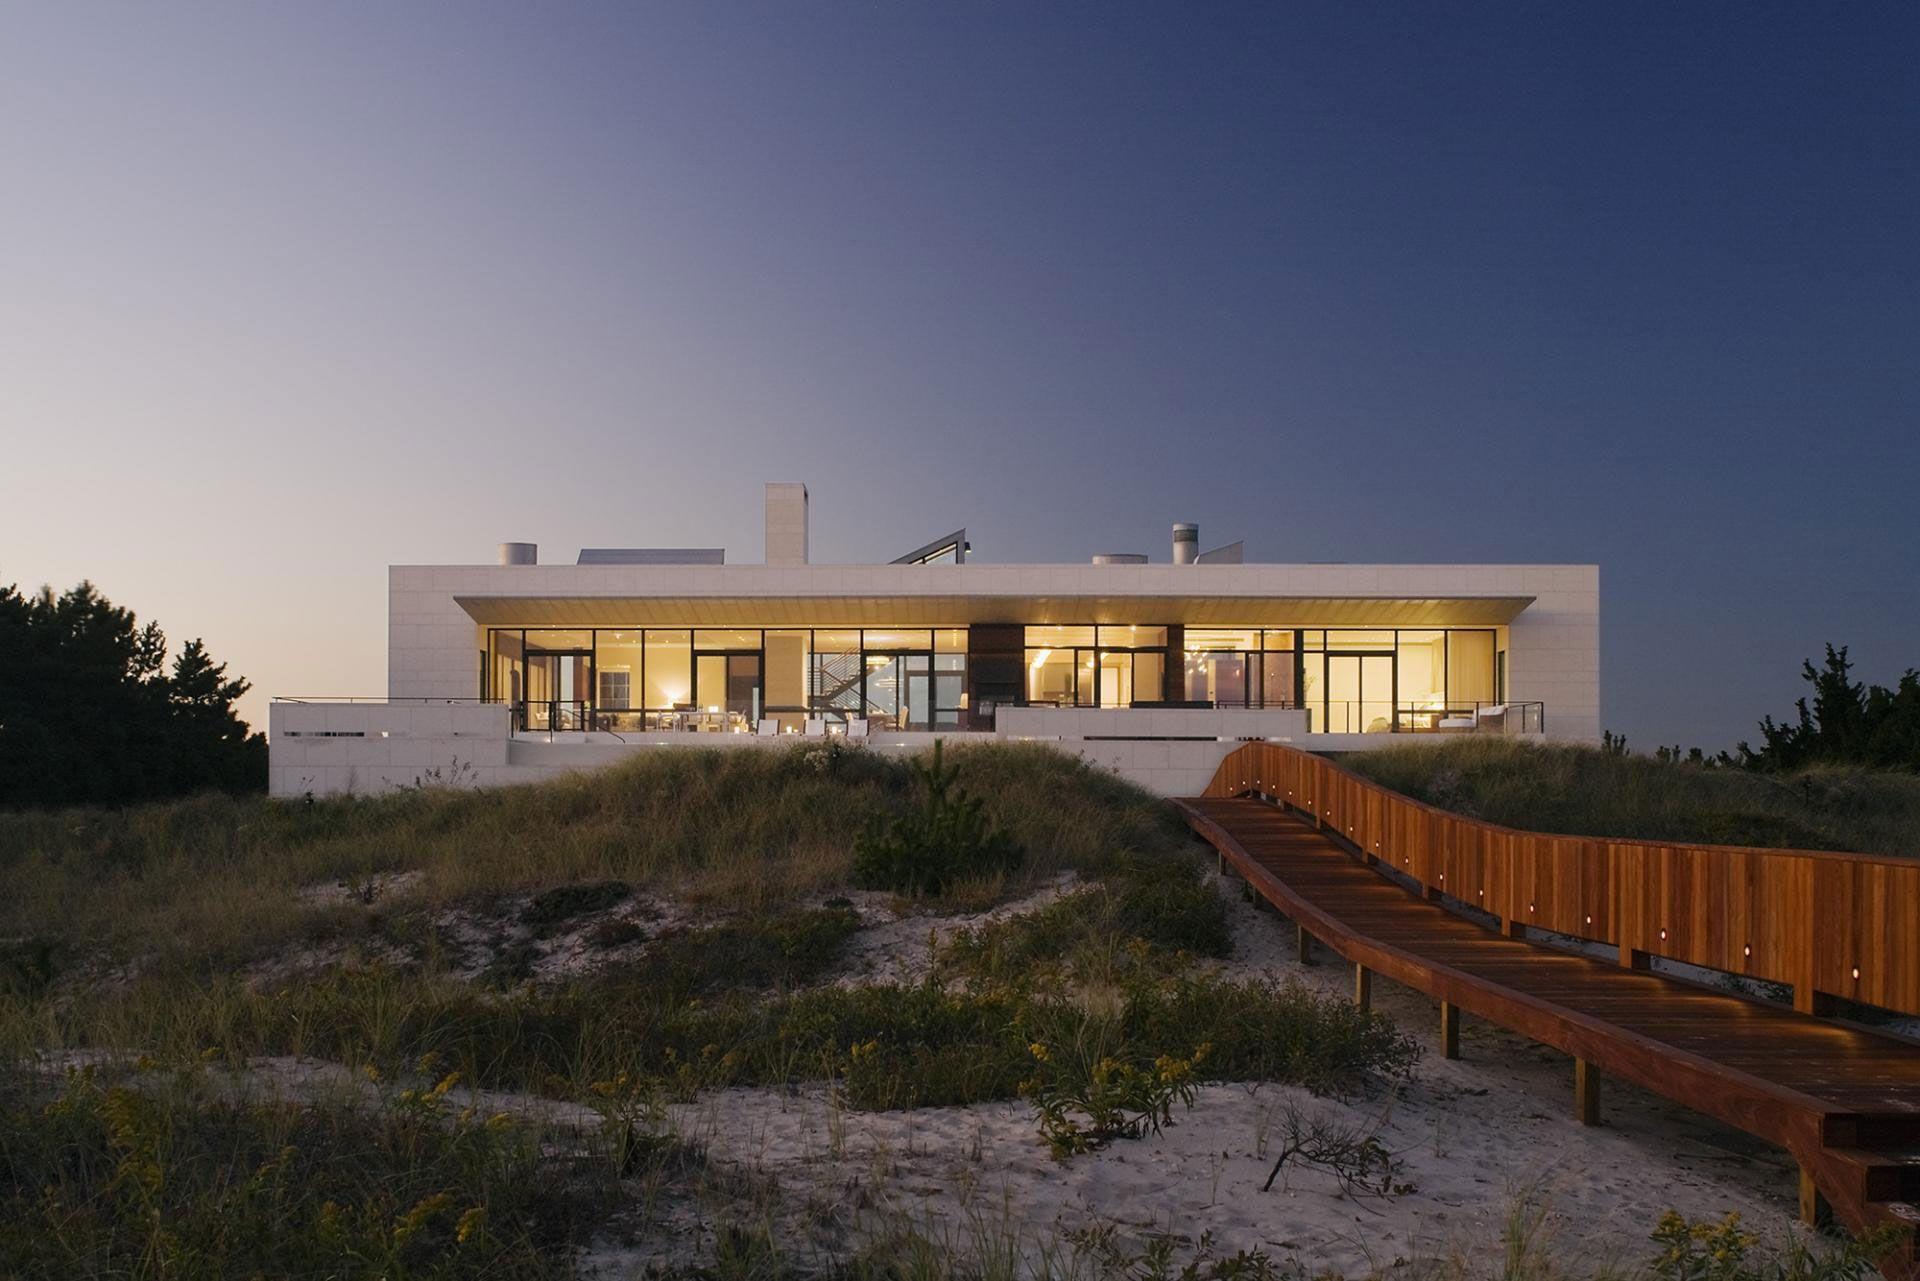 Southampton Beach House By Alexander Gorlin Architects In New York